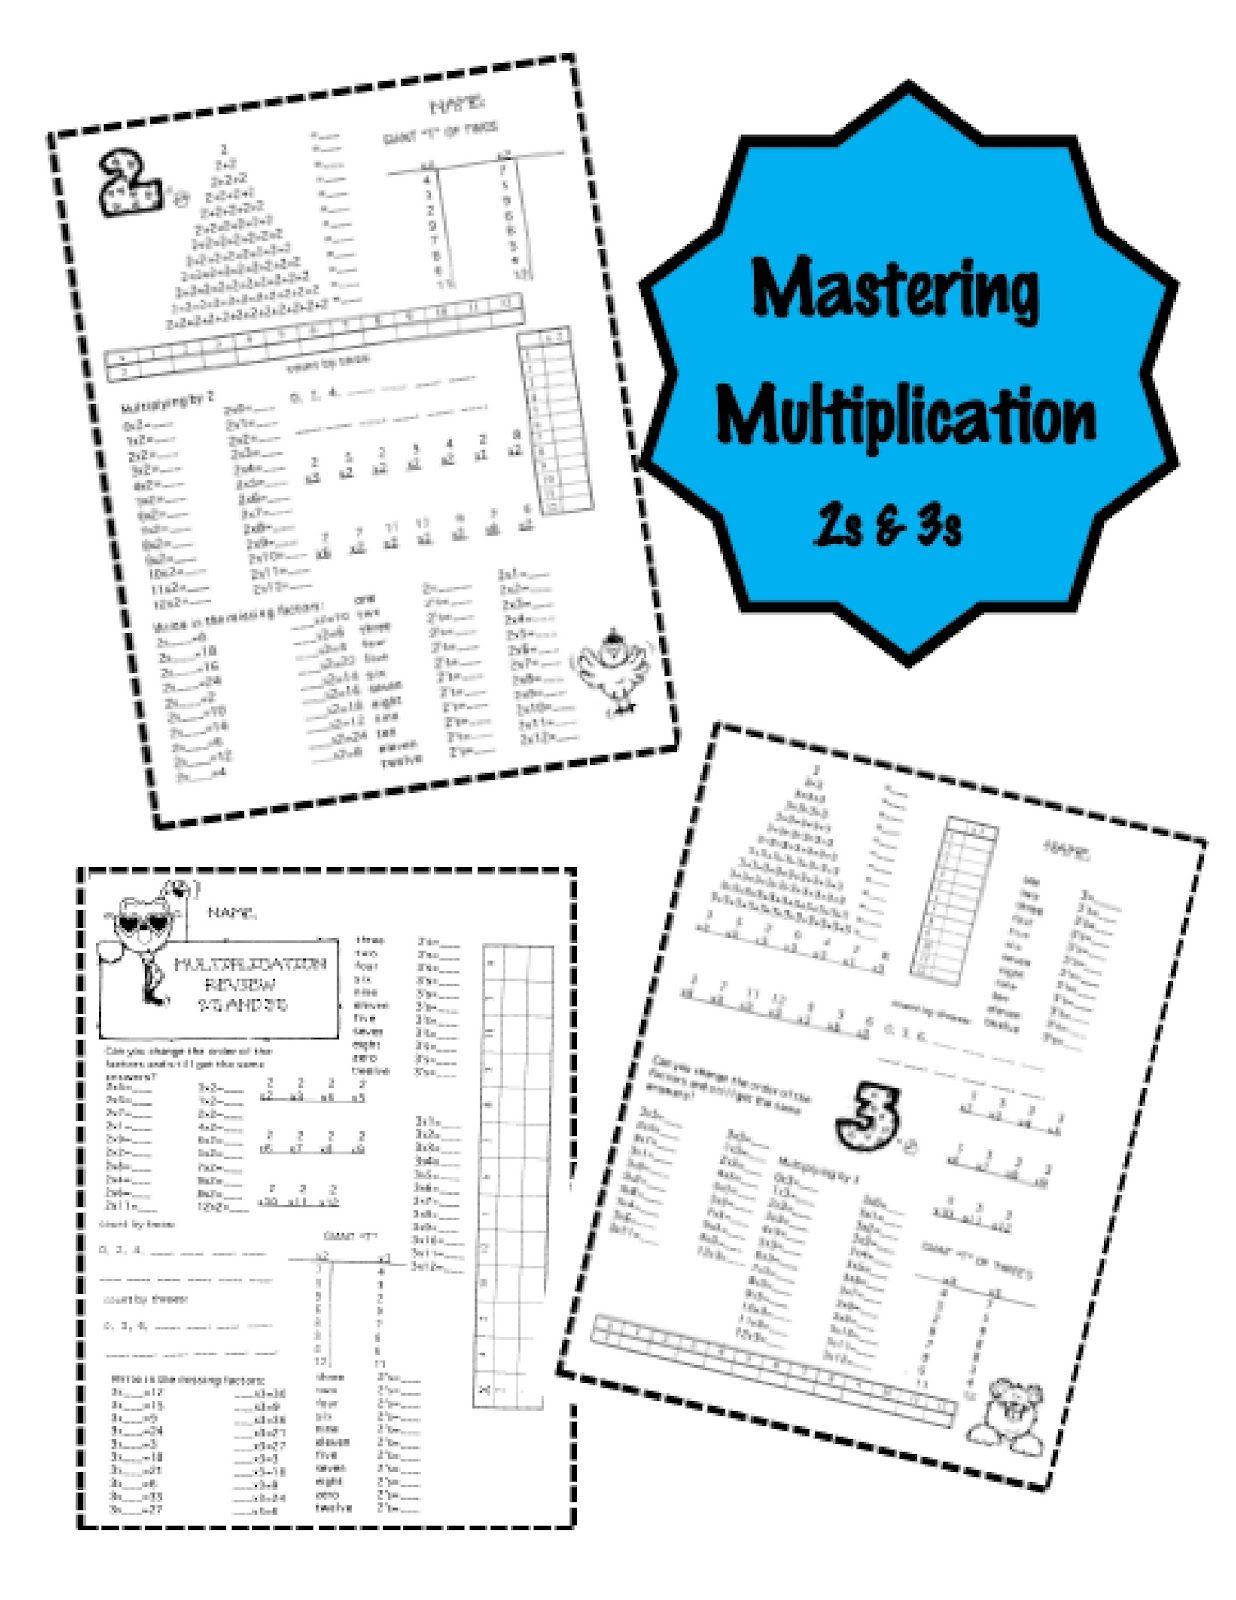 Mastering Multiplication Really Does Matter